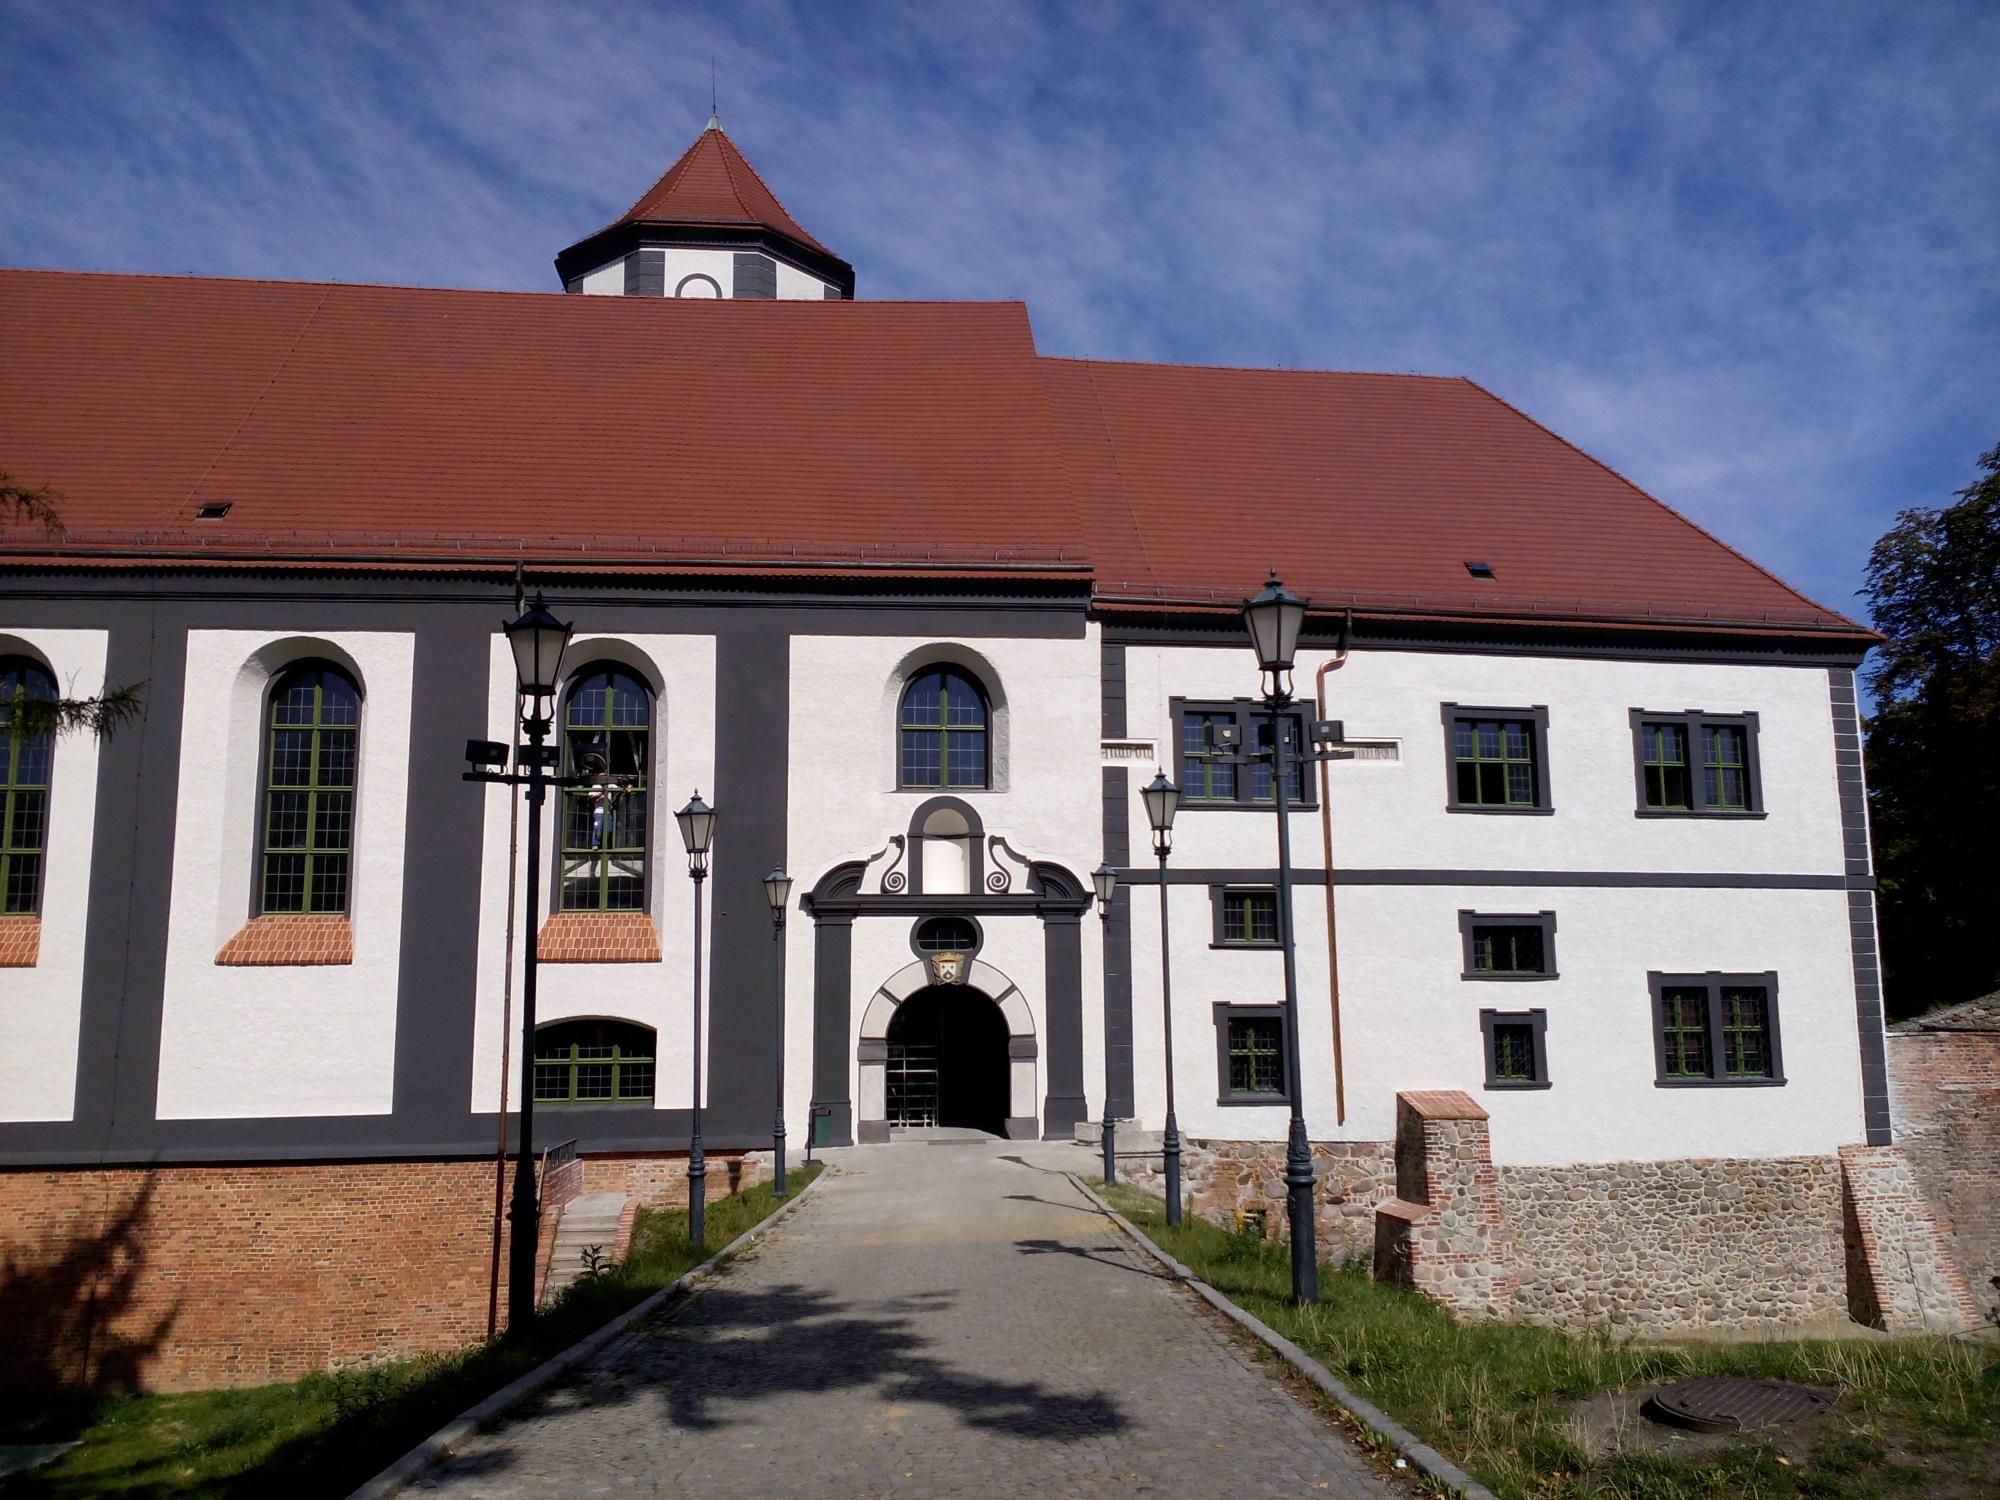 Kożuchów castle